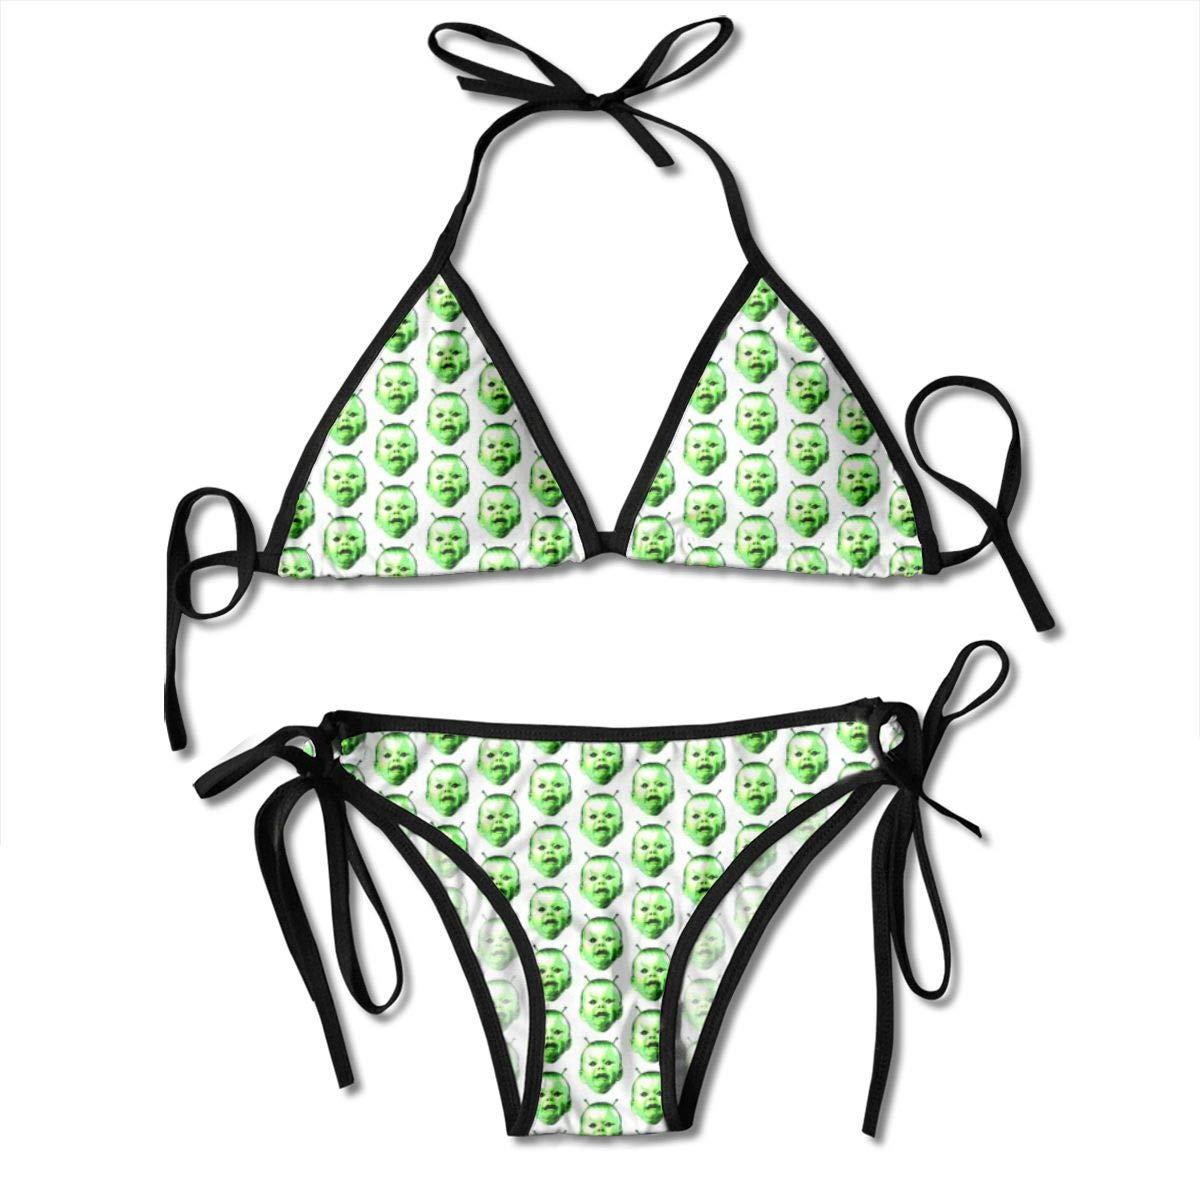 Green Alien Space Baby_2167 Bikini de Moda para Mujer Traje ...